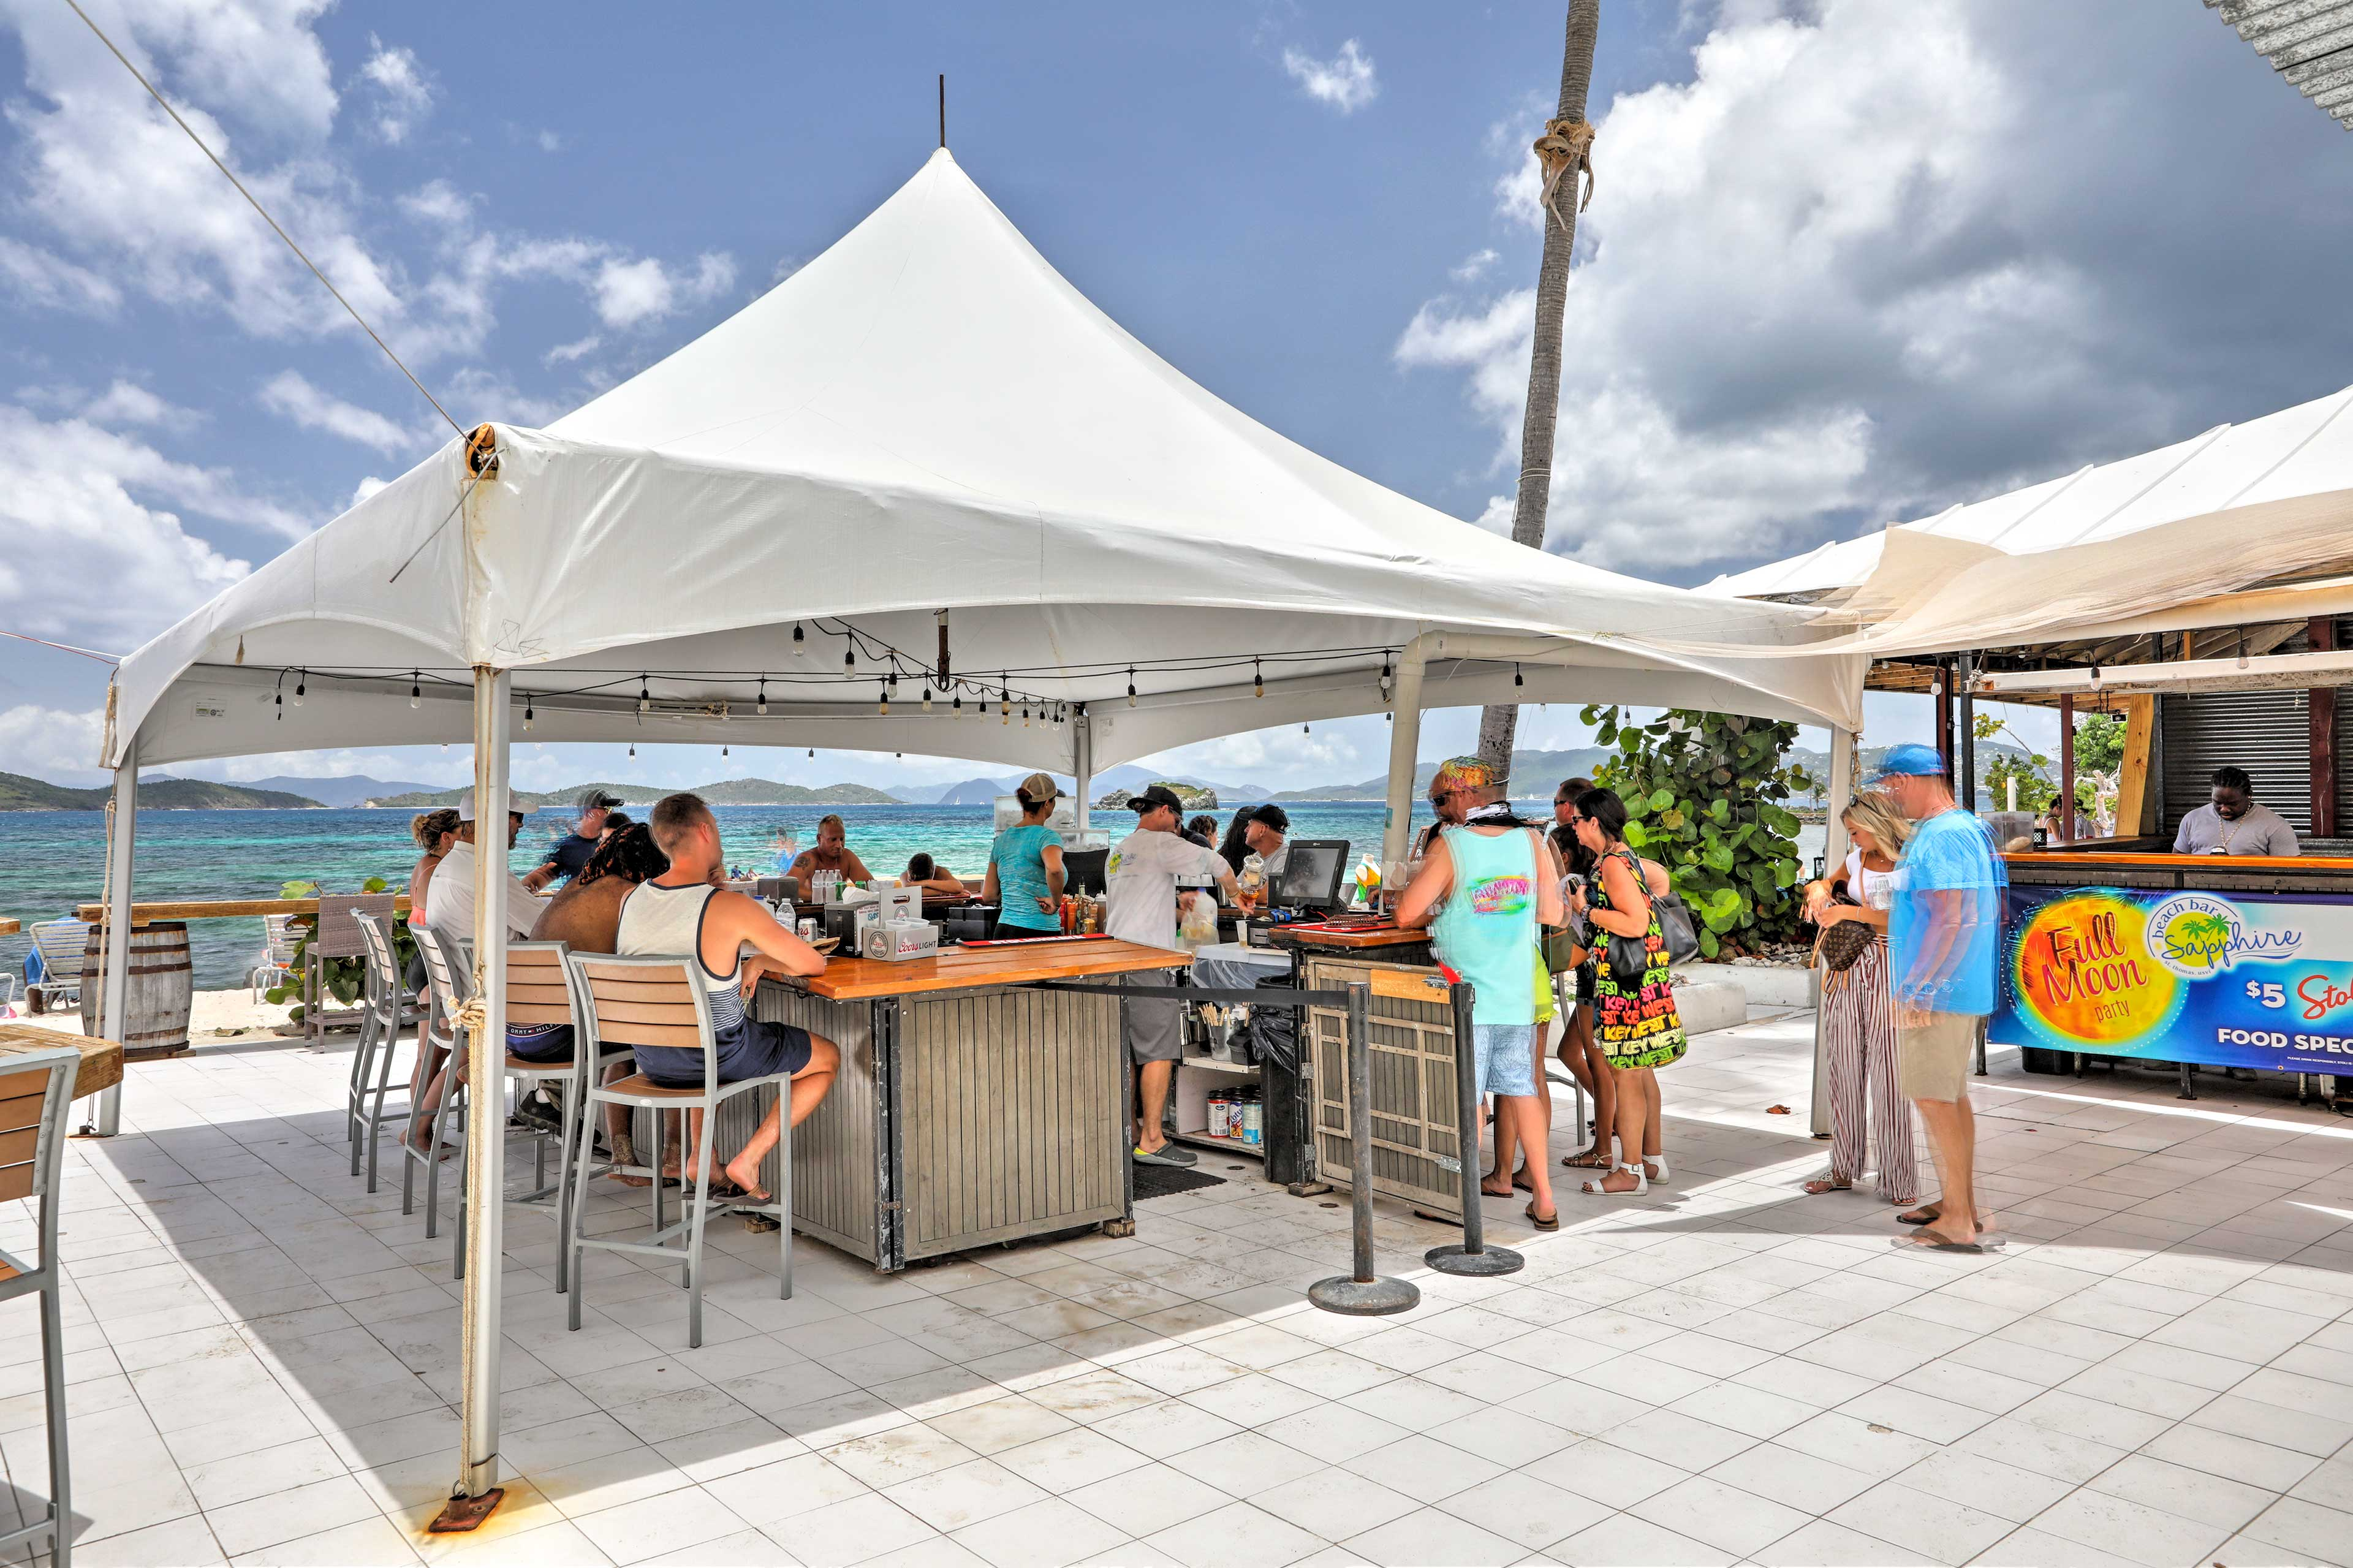 Meet other travelers at the popular beachfront tiki bar!